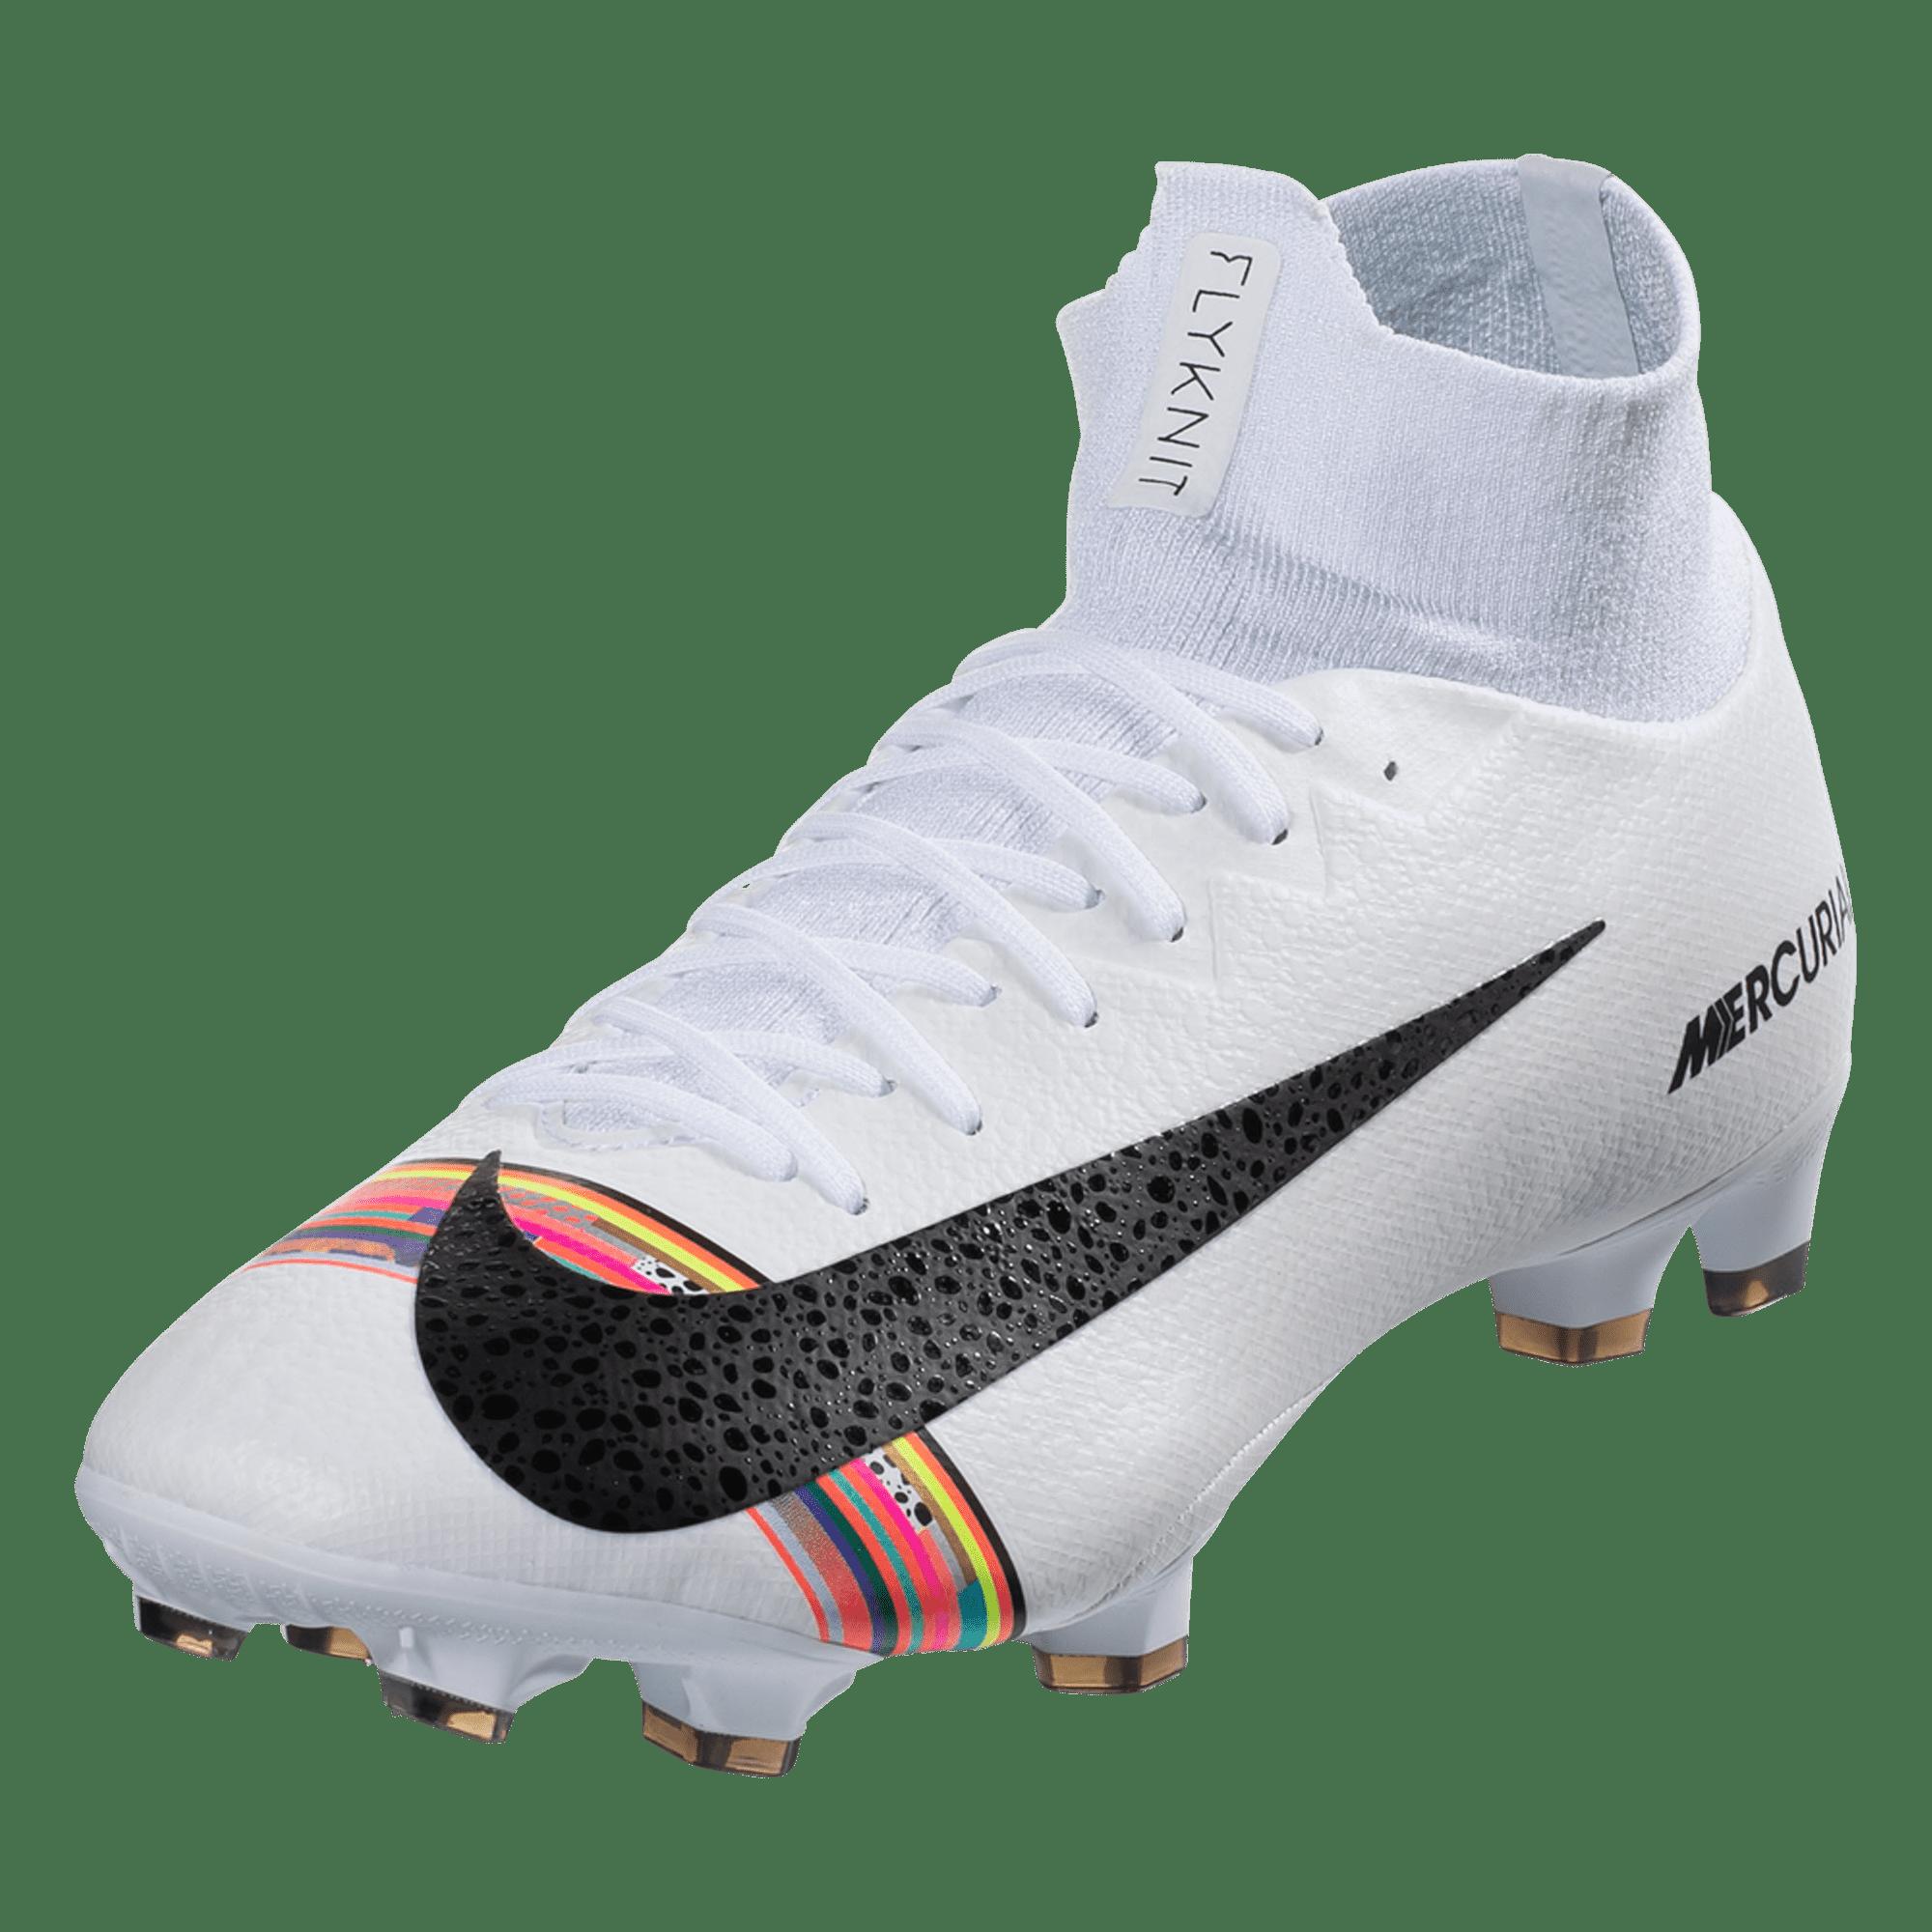 96274da49b6e Nike Mercurial Superfly VI Pro SE FG Soccer Cleat – Platinum / Black / White